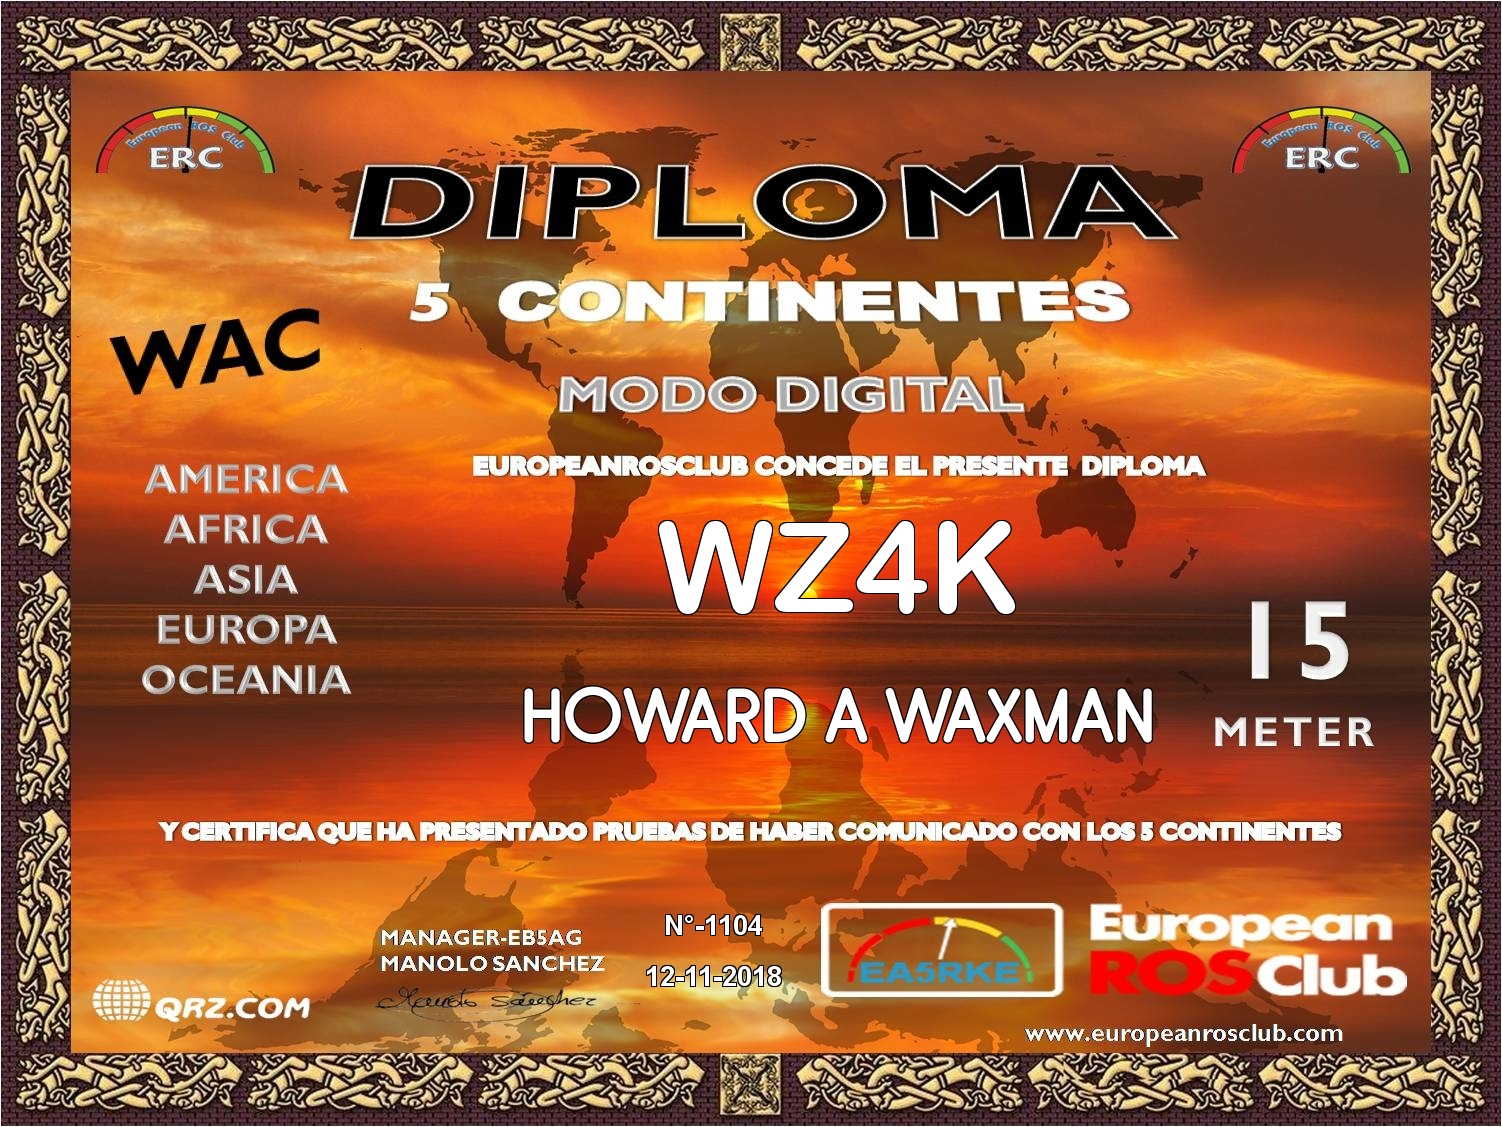 WZ4K-DCM-15M (1)